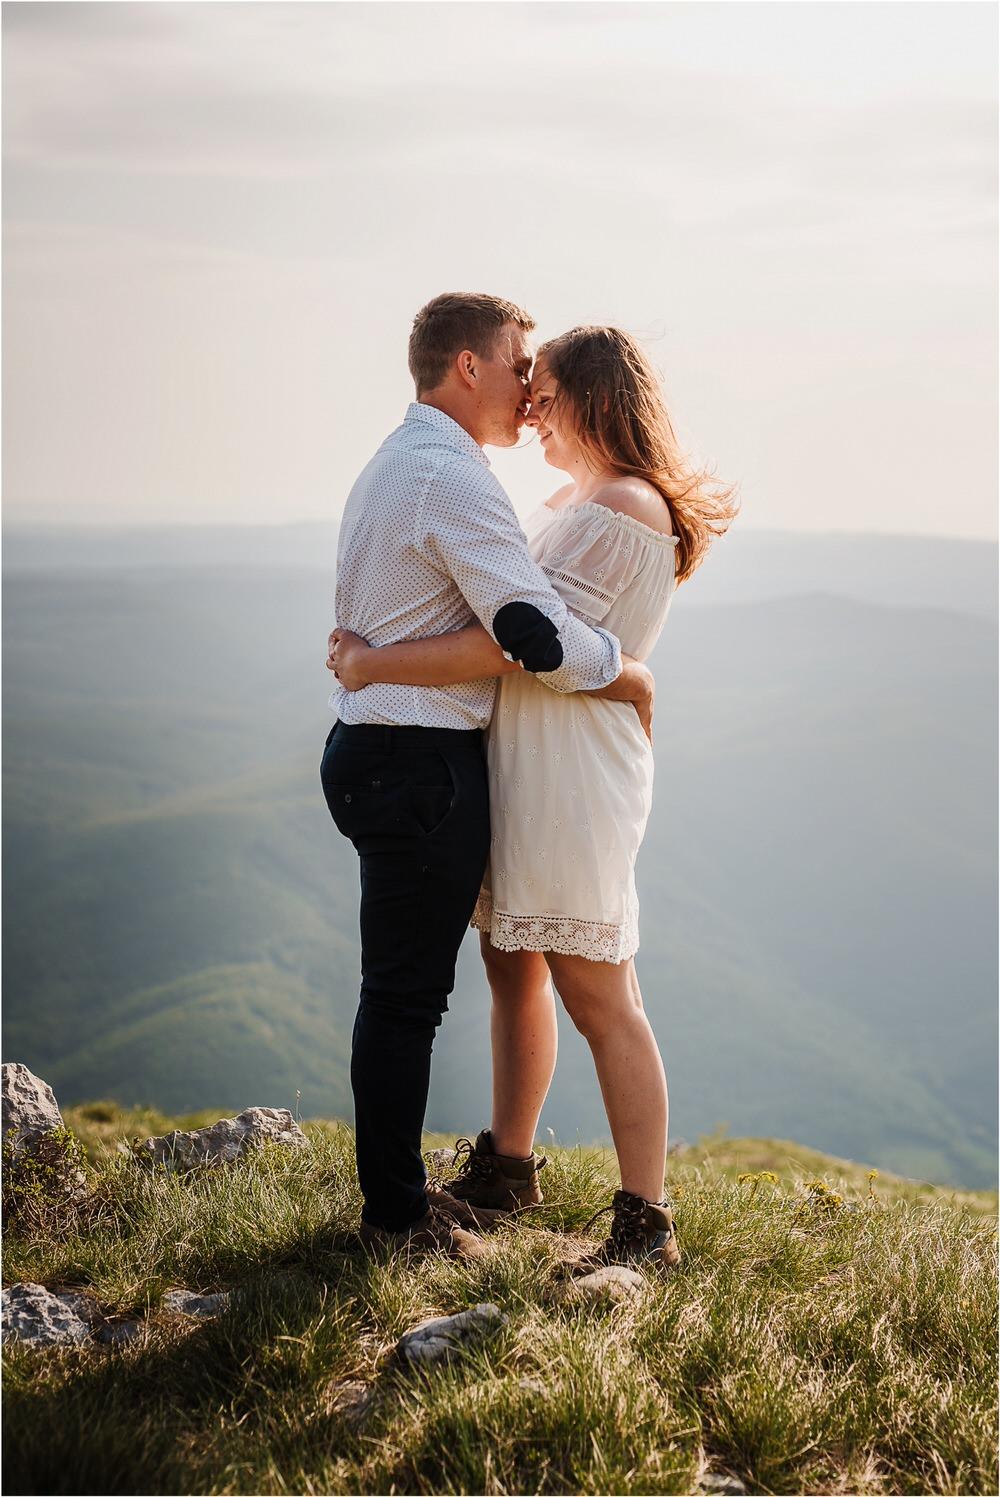 nanos slovenia mountain engagement poroka zaroka zarocno fotografiranje boho wedding chic nika grega slovenia slovenija 0012.jpg